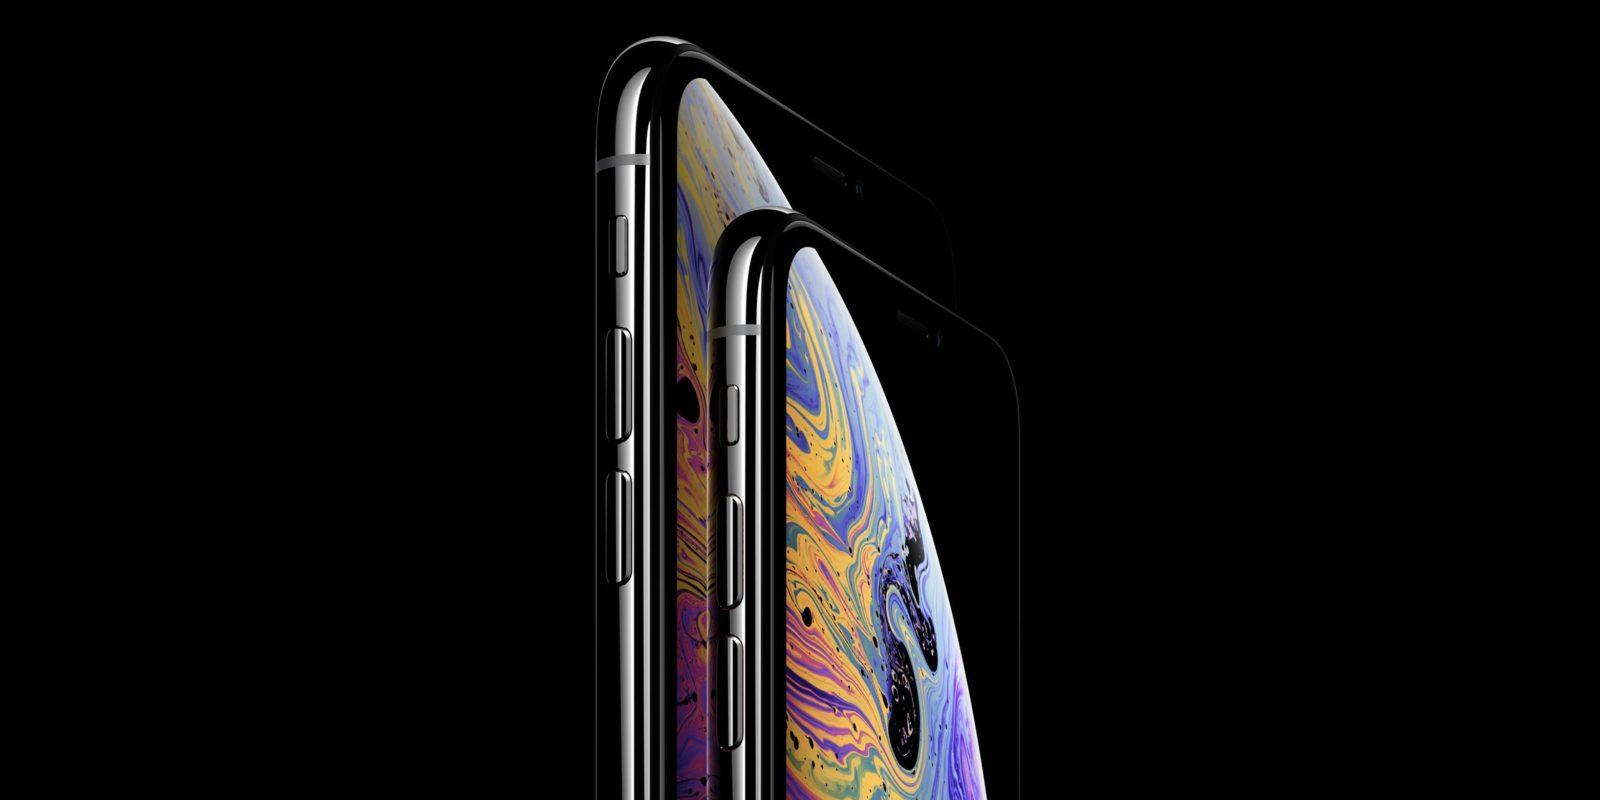 iPhone - 9to5Mac